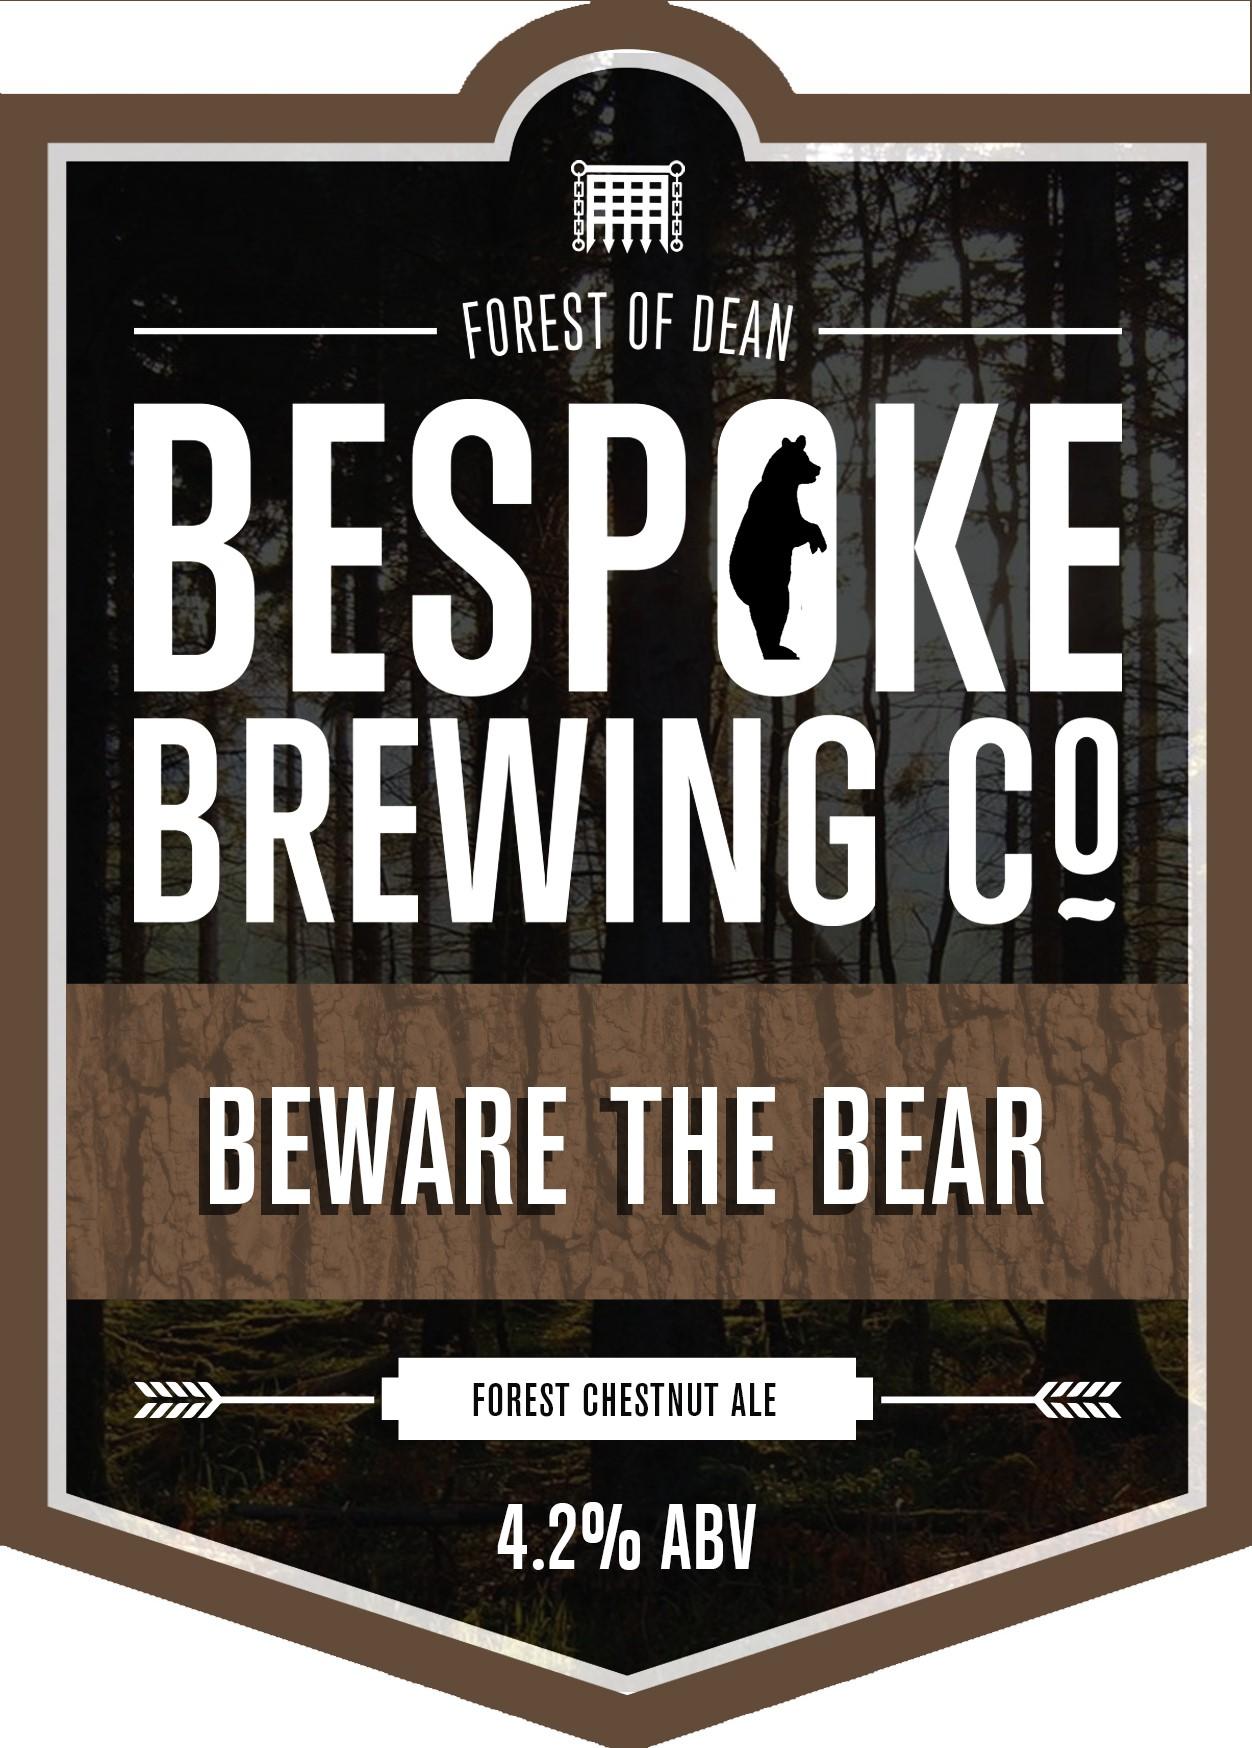 Bespoke Beware The Bear 9 Gallons Chestnut 4.2%